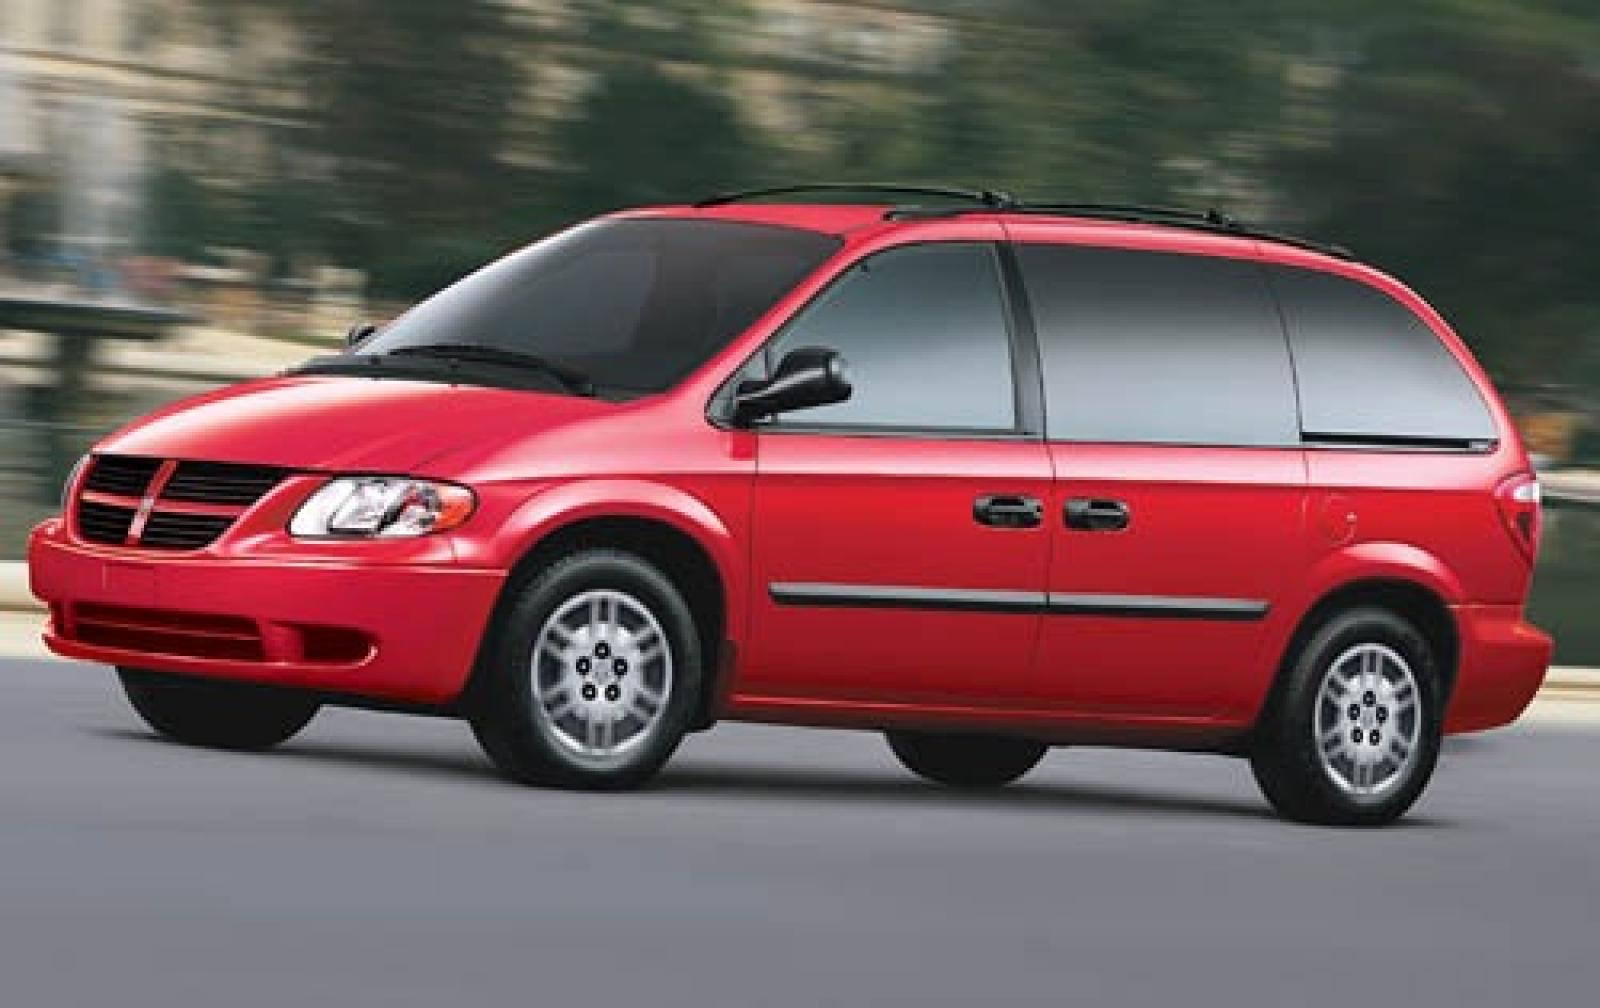 800 1024 1280 1600 origin 2007 dodge caravan